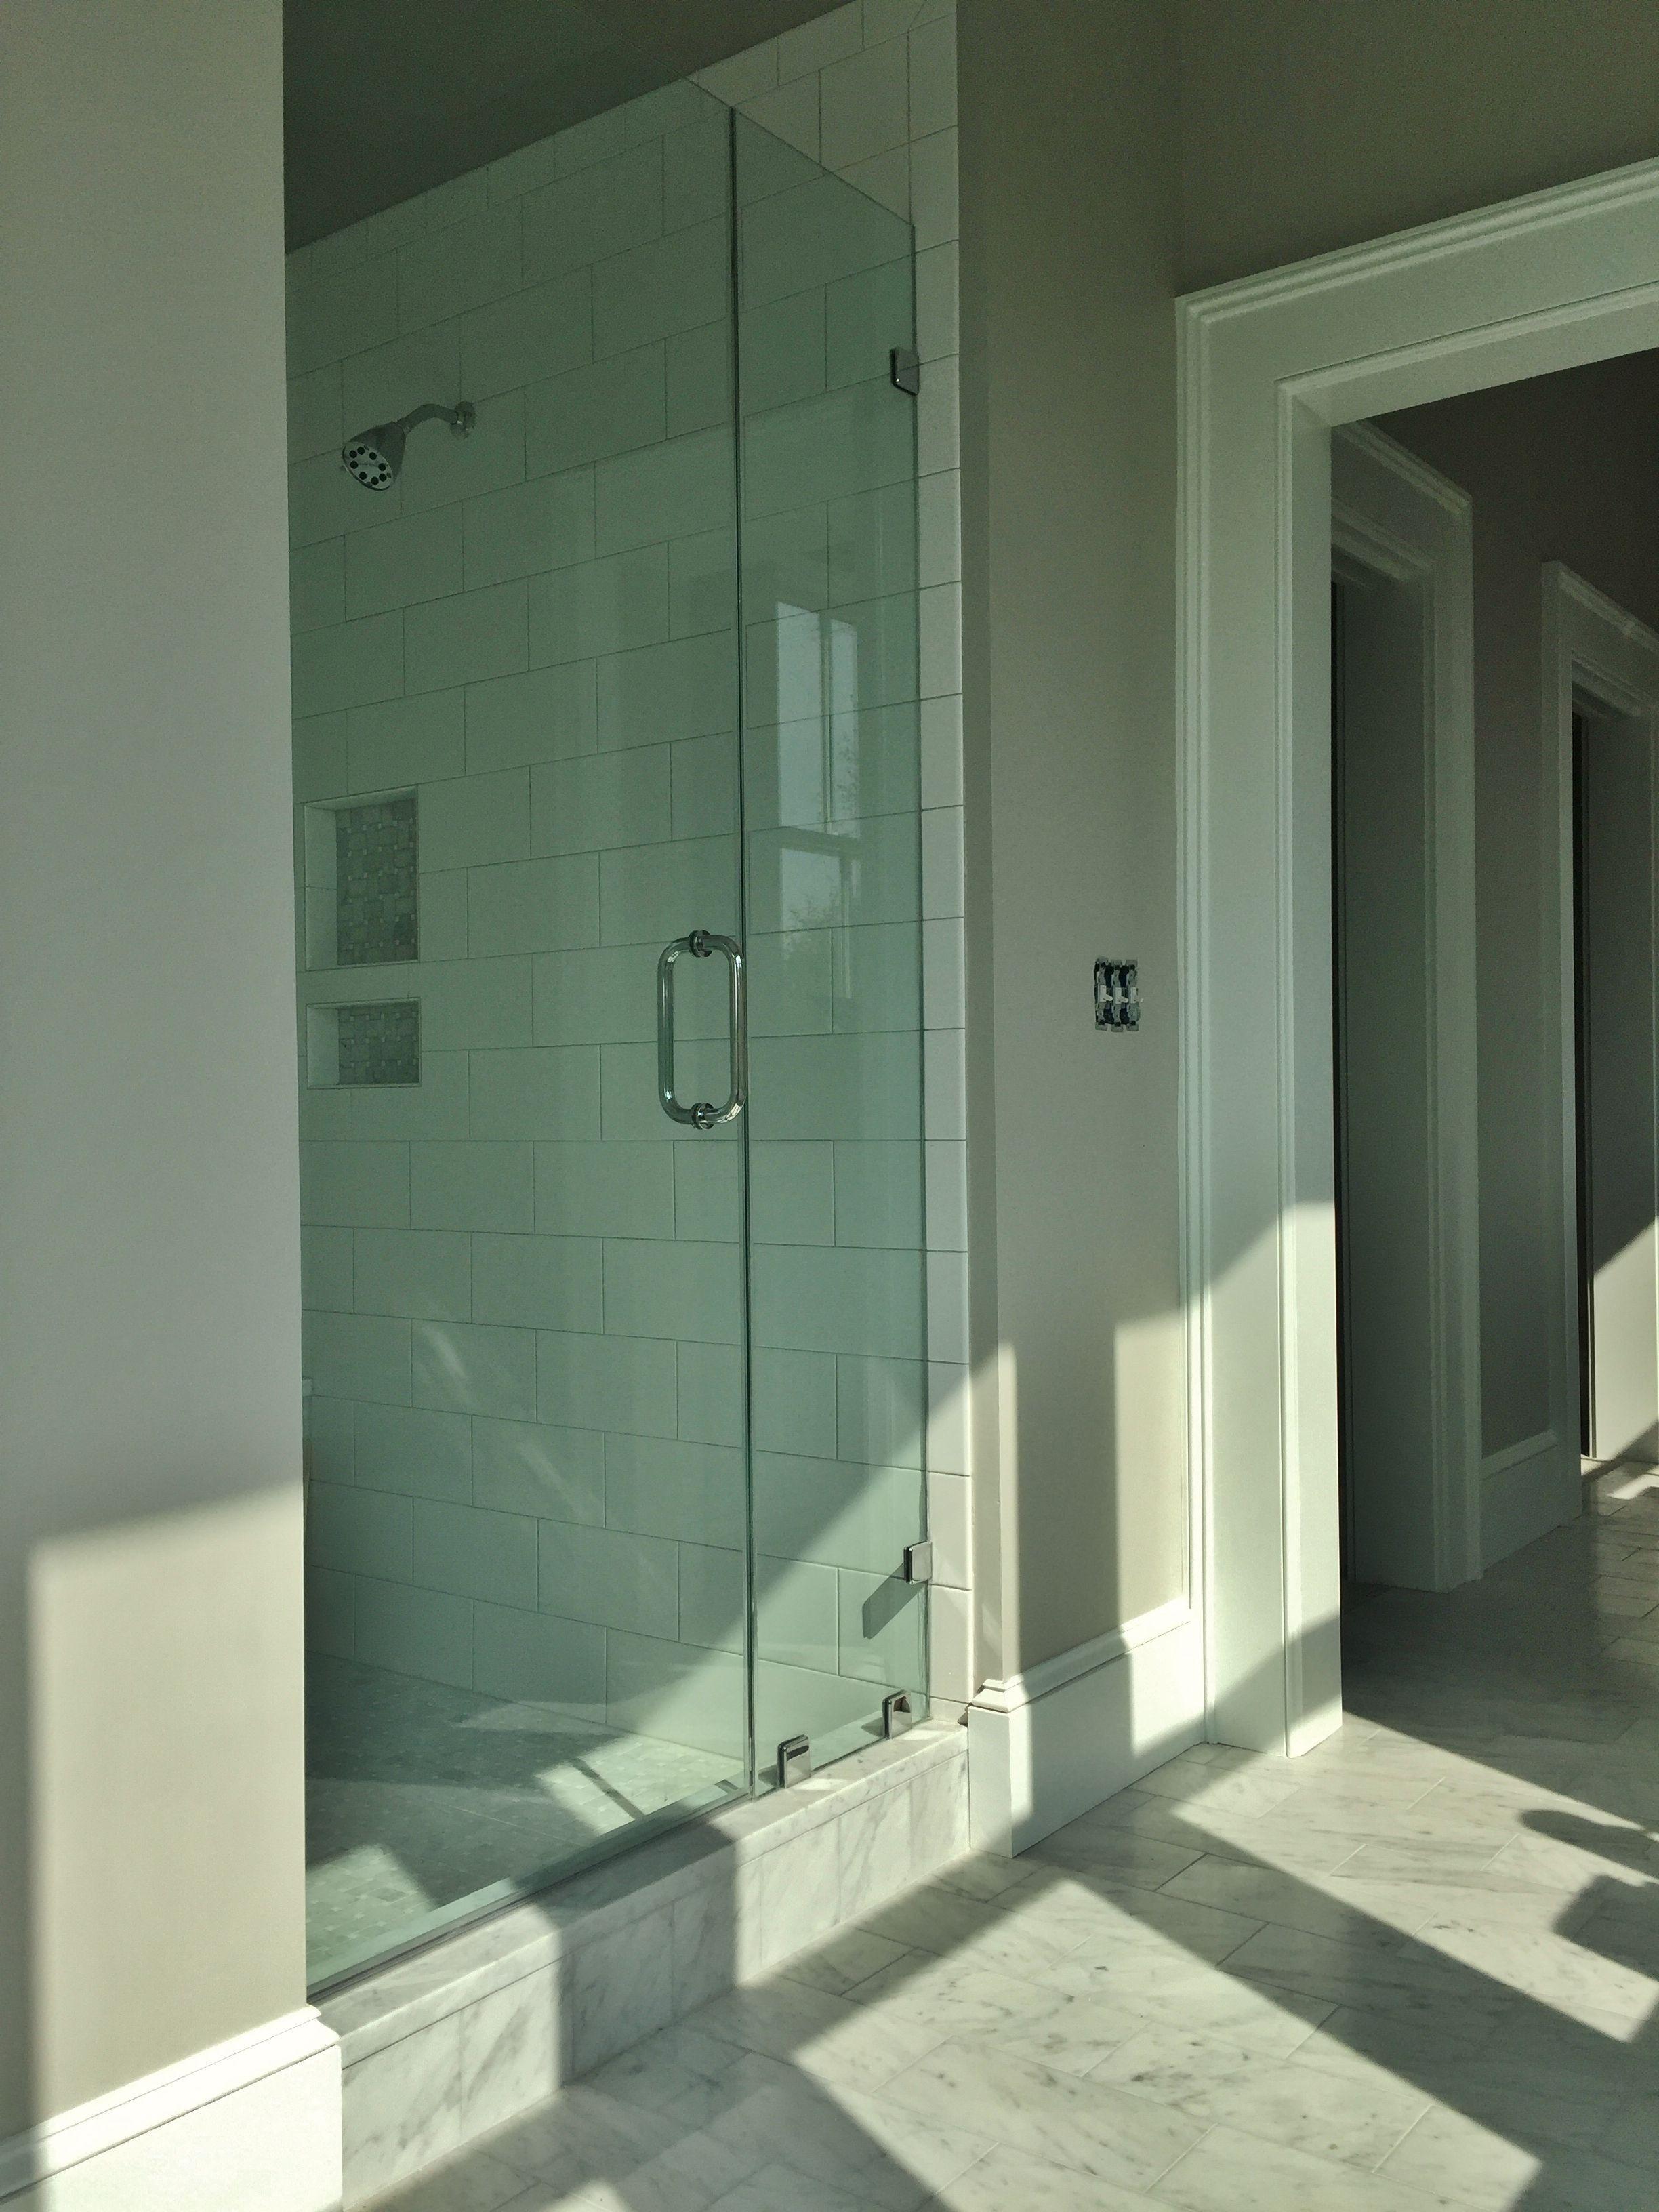 Tile Jobs Inspirational Master Bathroom 6x12 Carrara Marble Floor